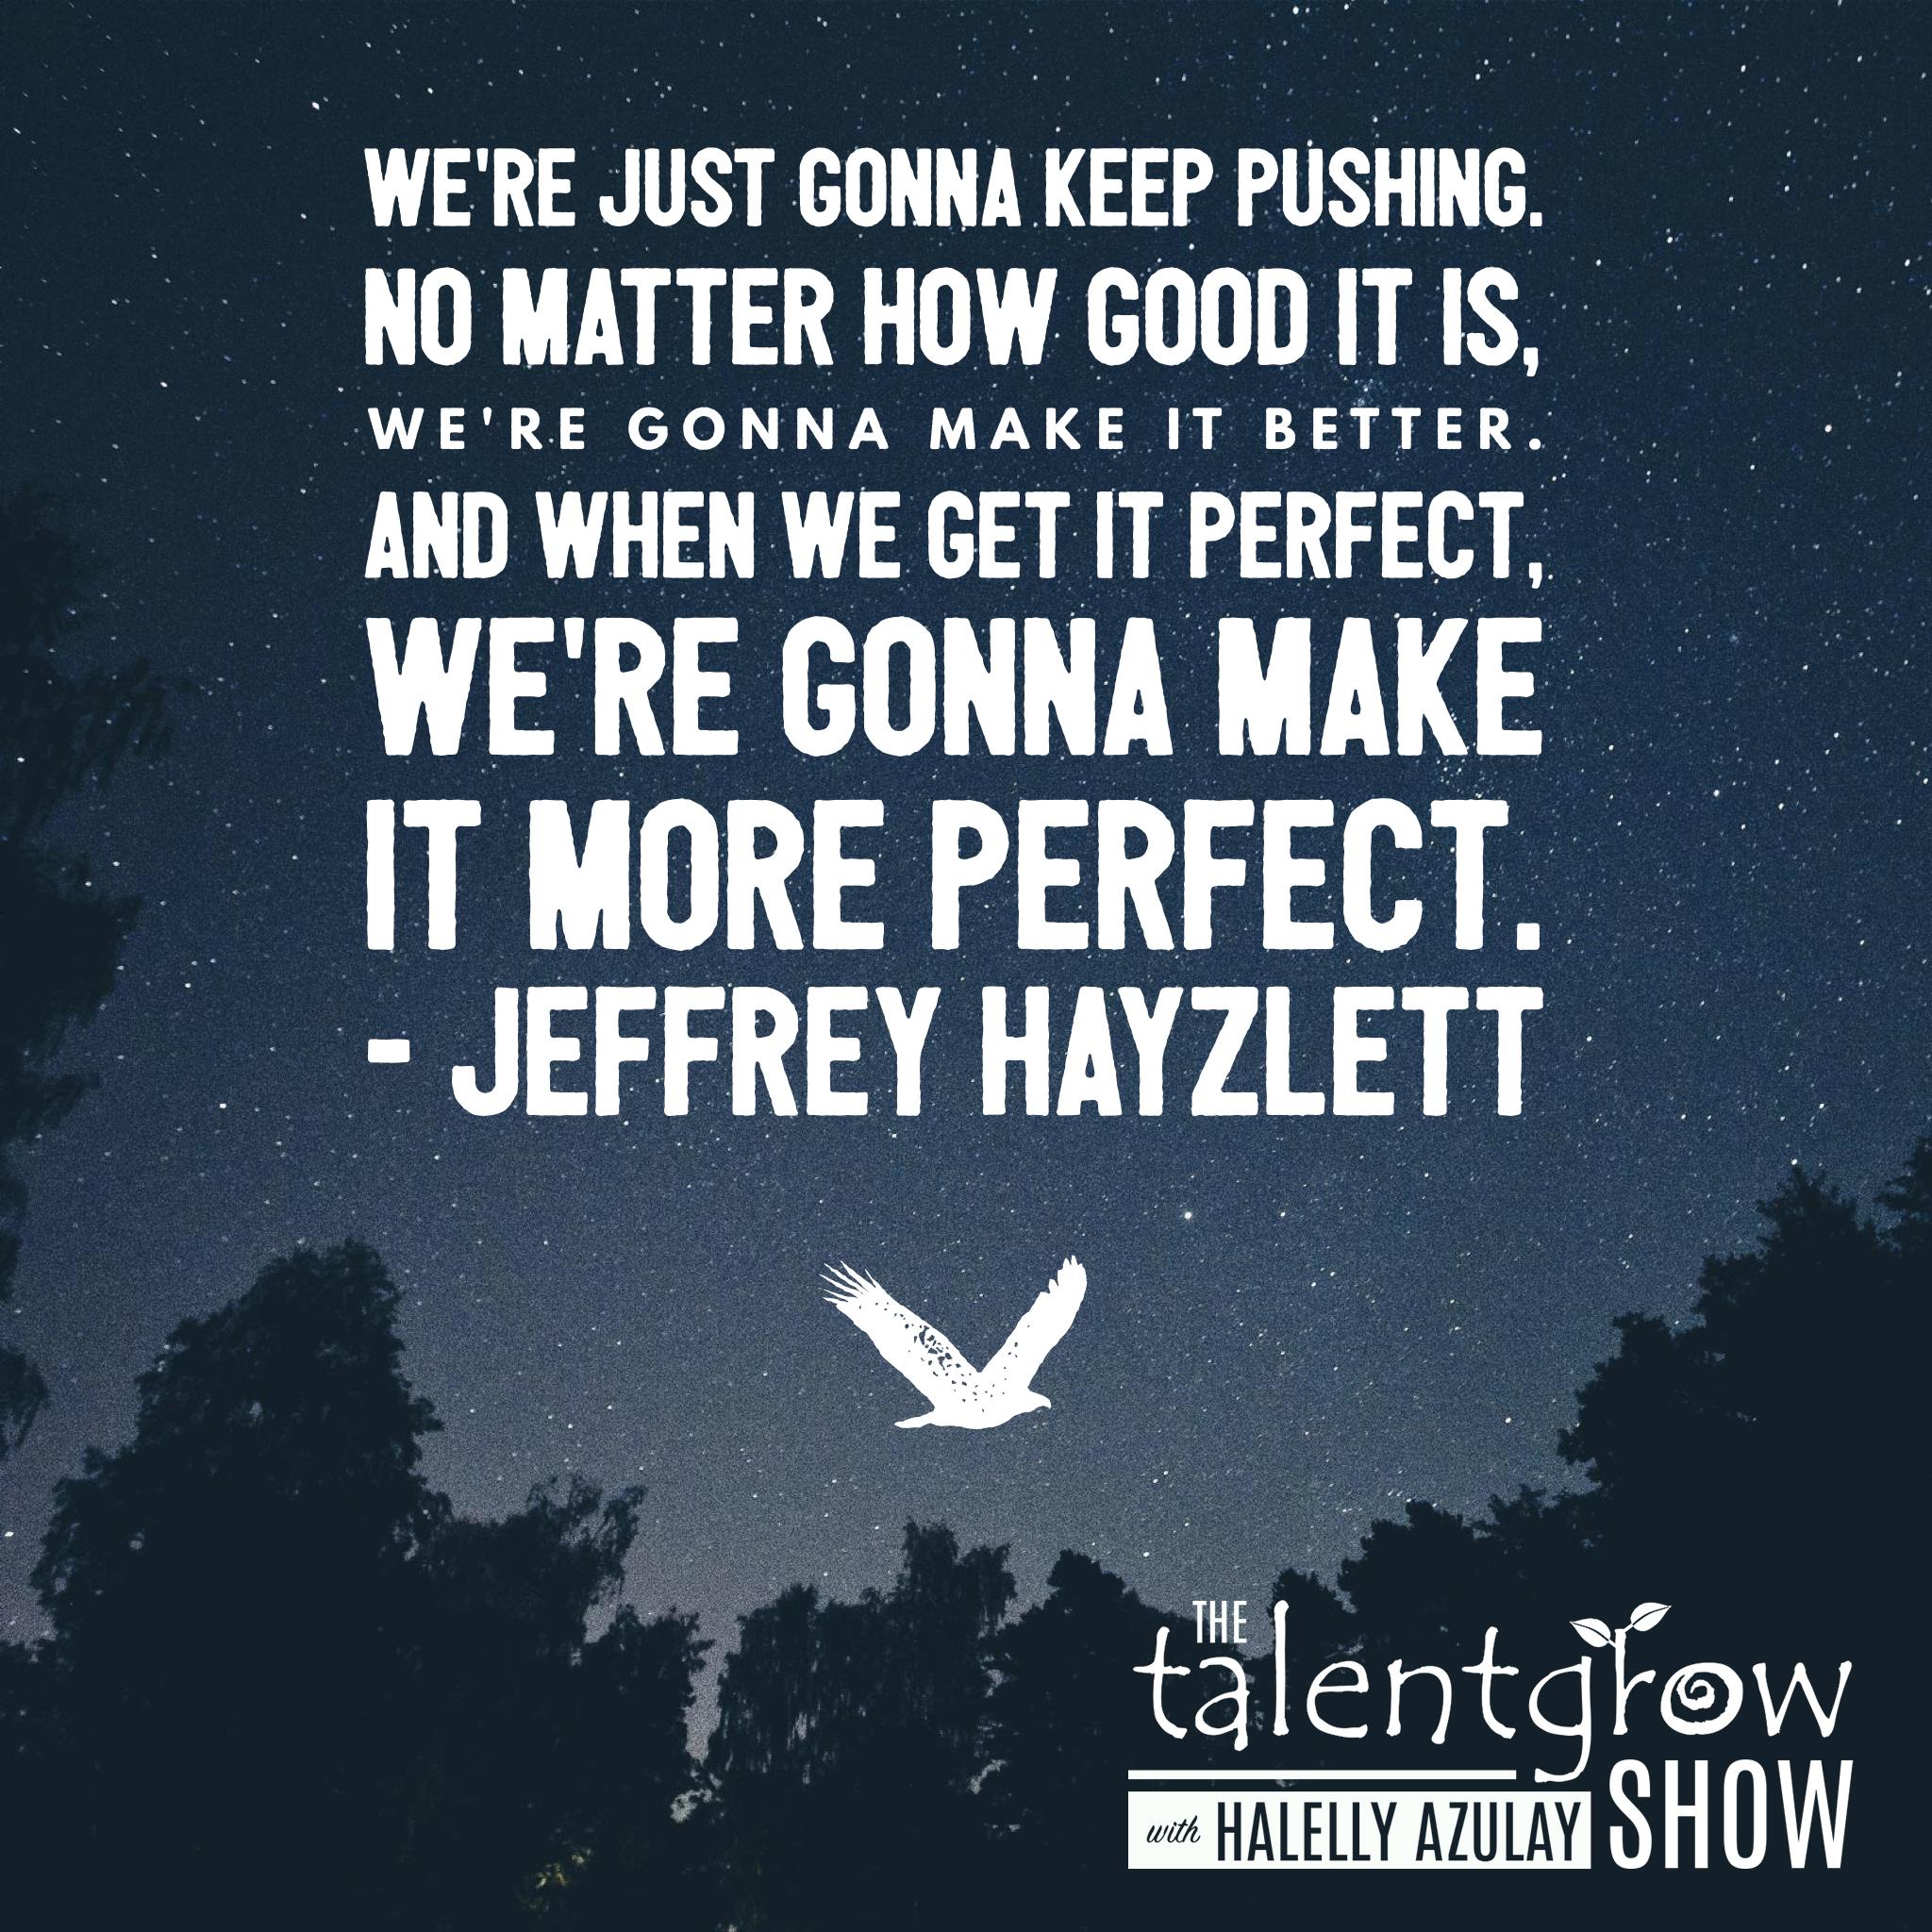 Business advice from Jeffrey Hayzlett on the TalentGrow Show with Halelly Azulay